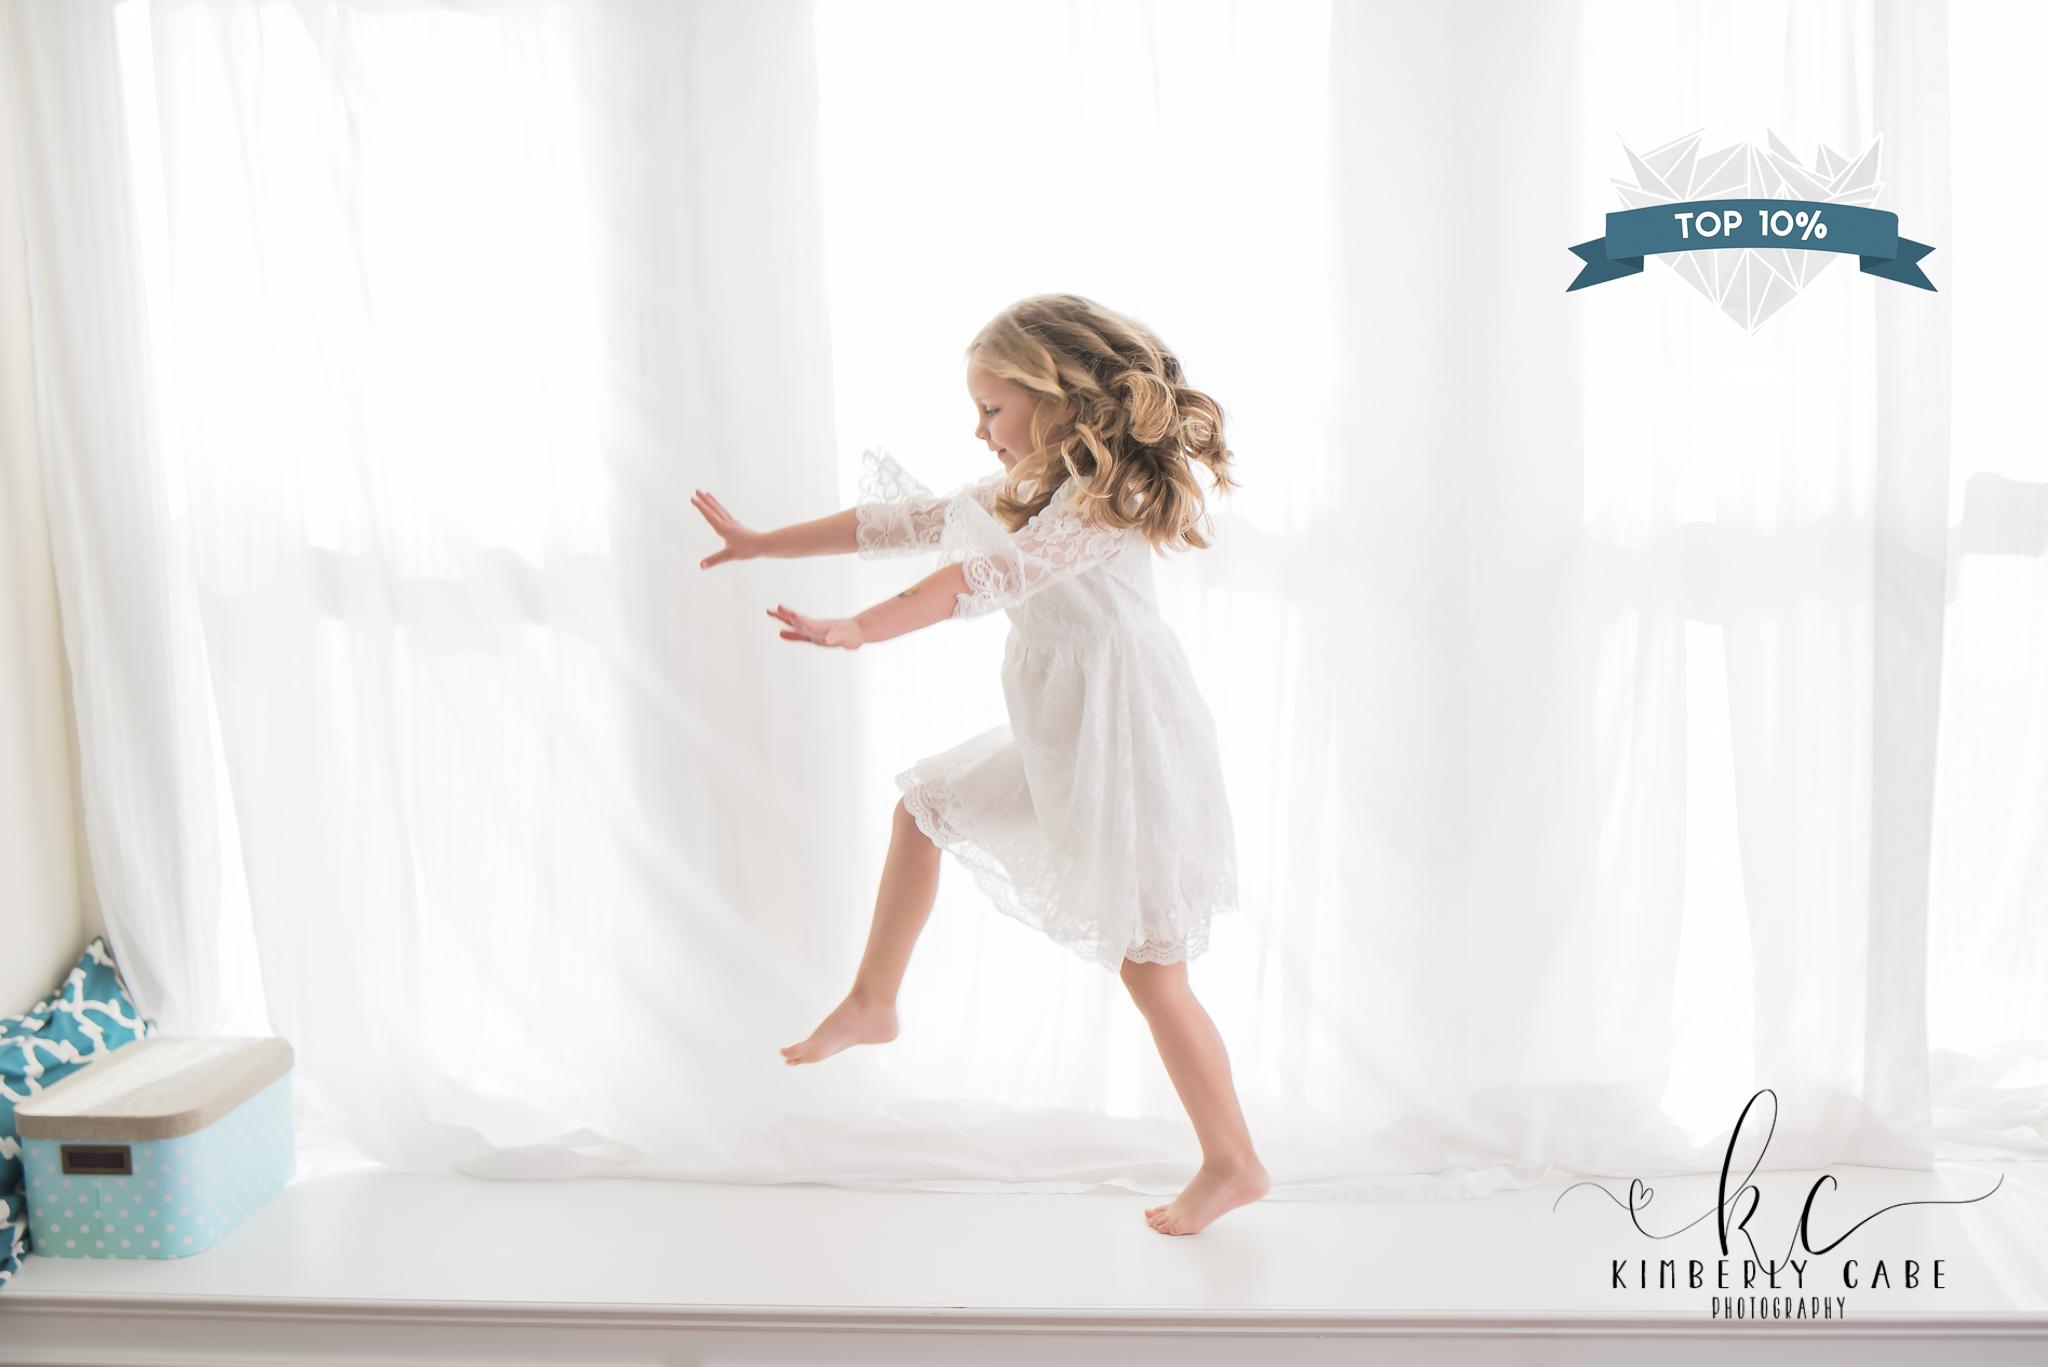 Kimbery Cabe Photography childrens photographer